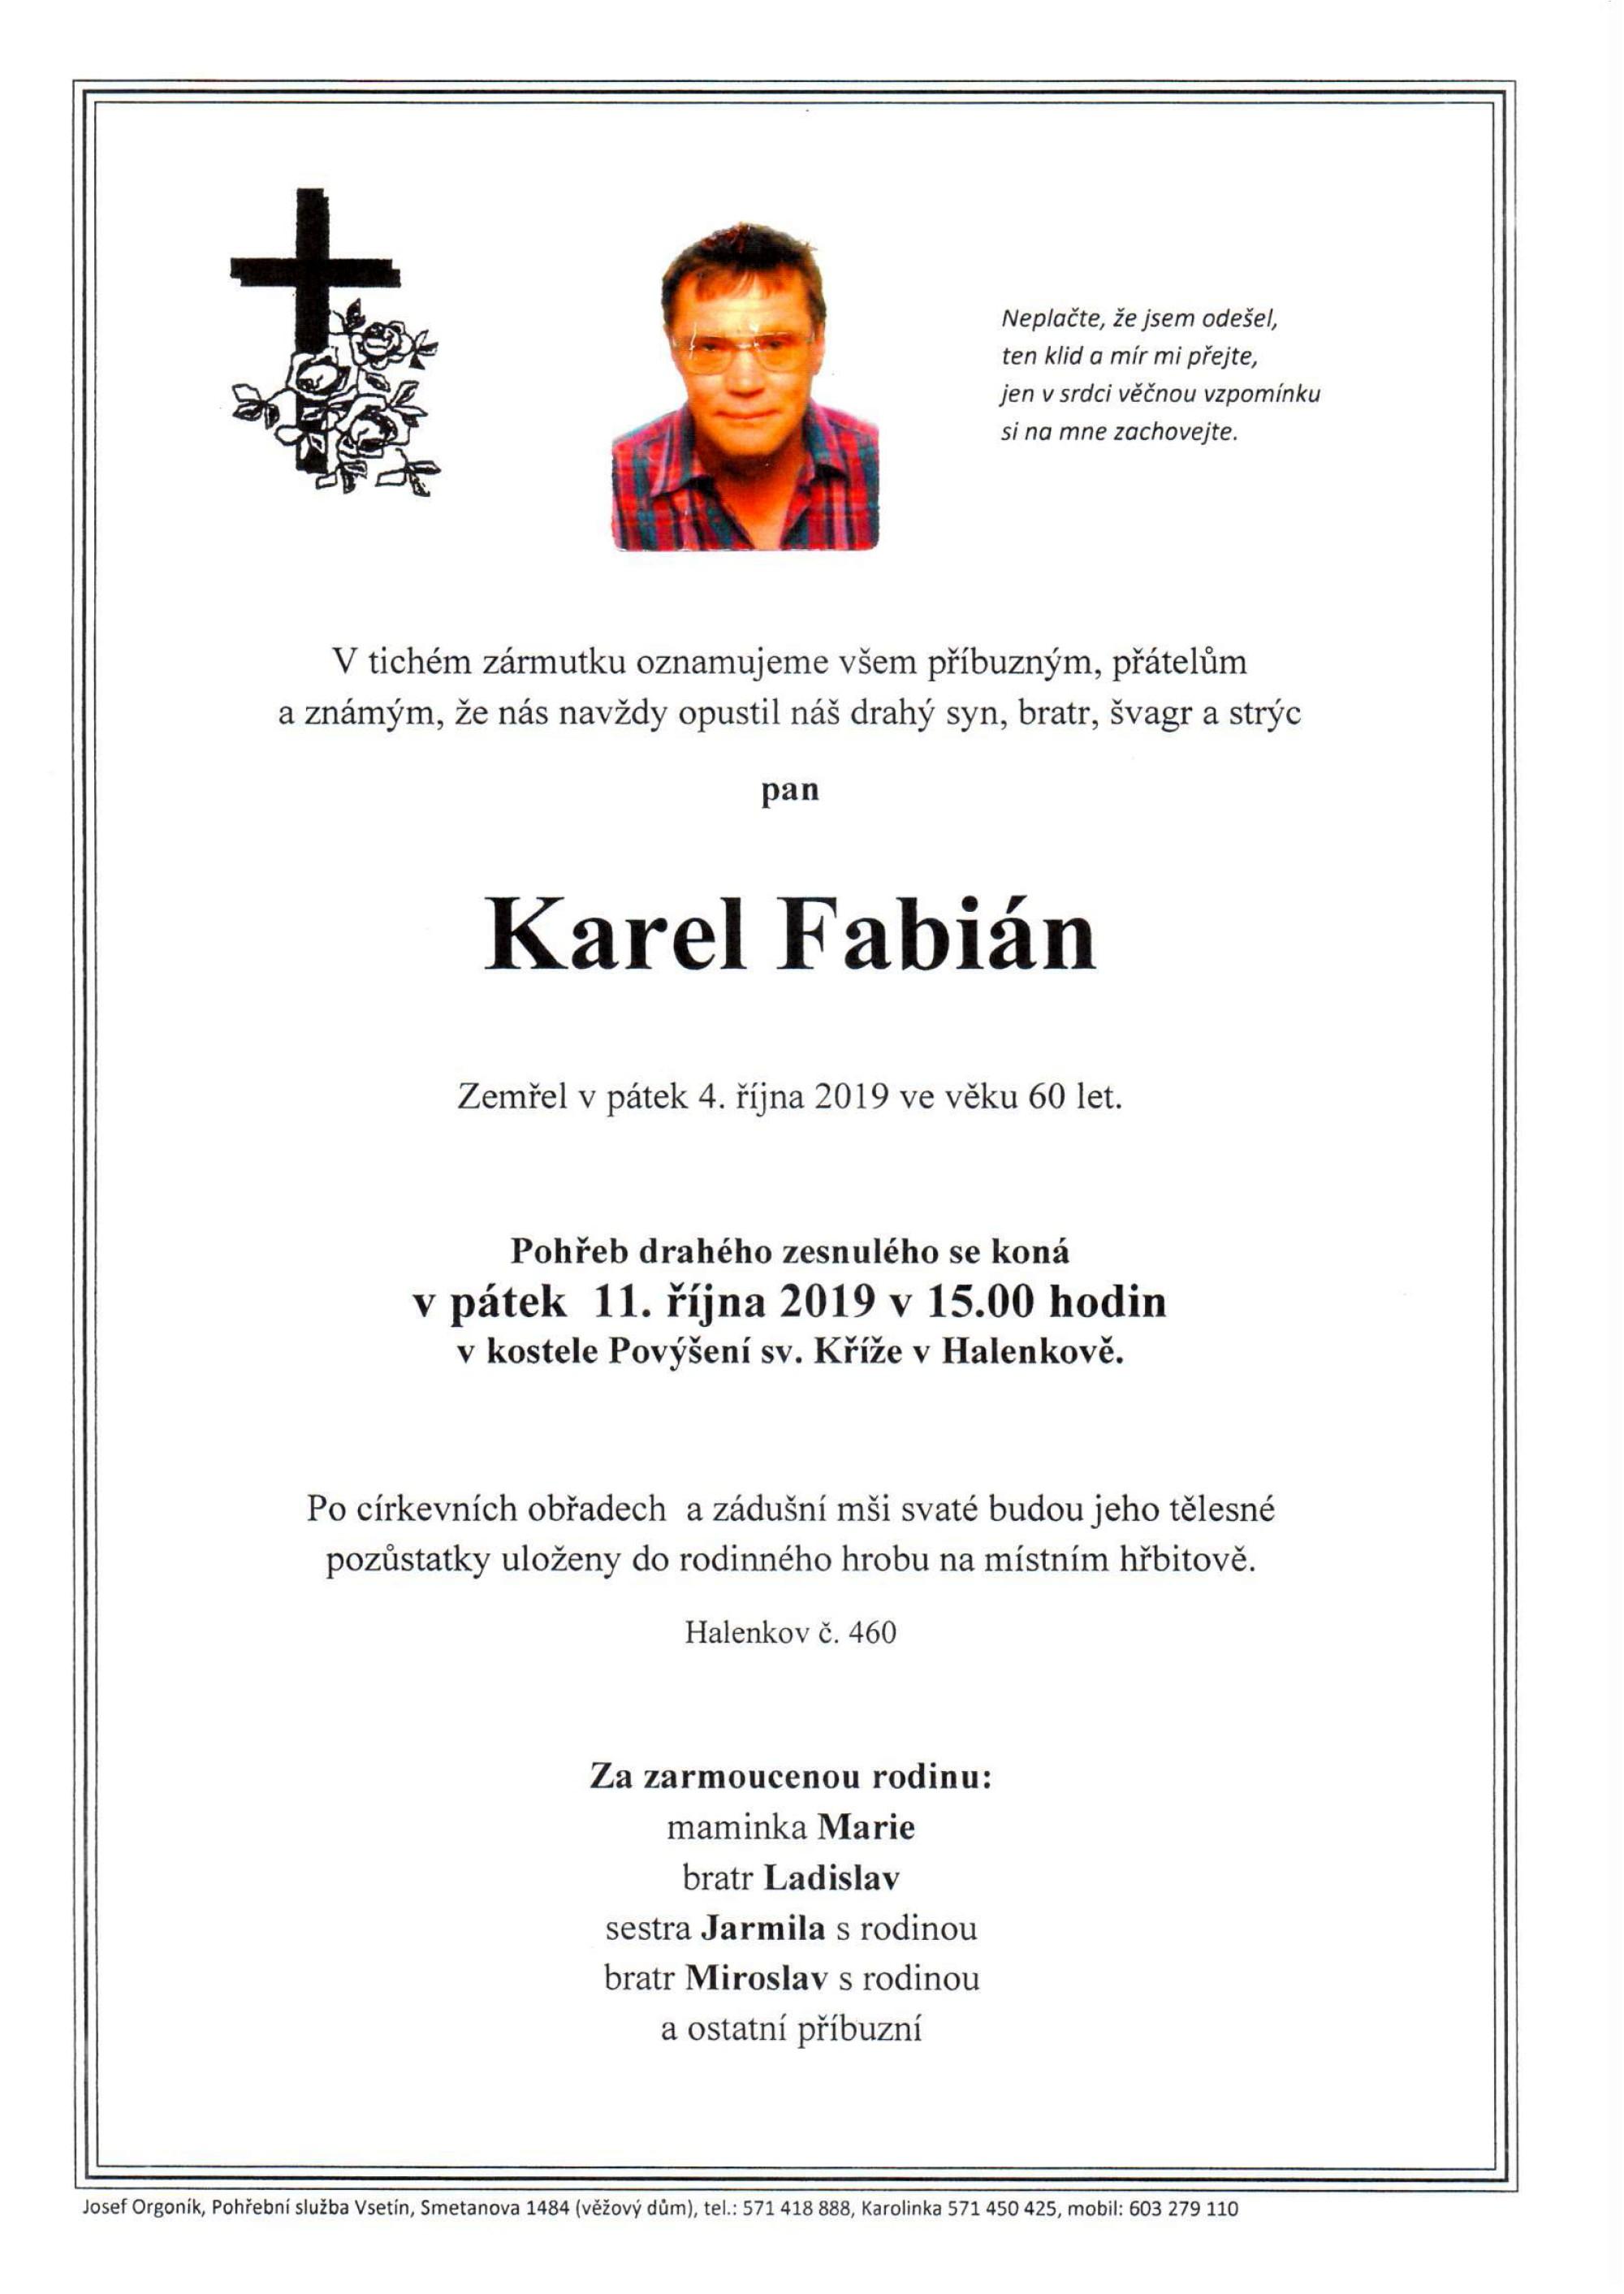 Karel Fabián